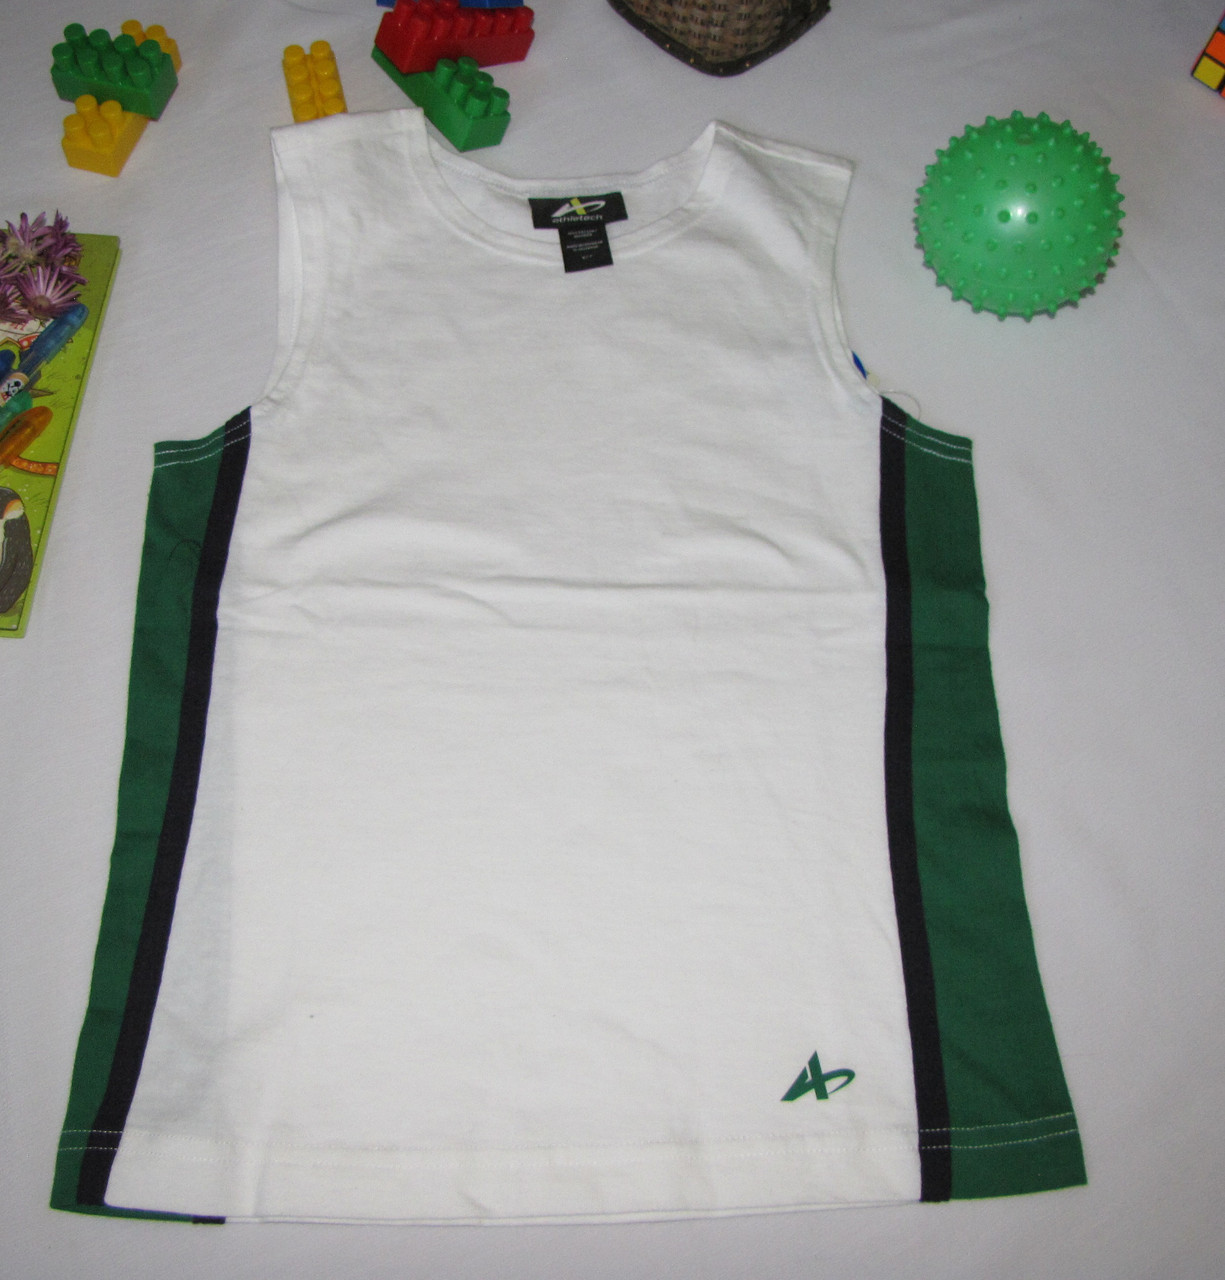 Спортивная майка Athletech рост 116 см белая+зеленая 07088